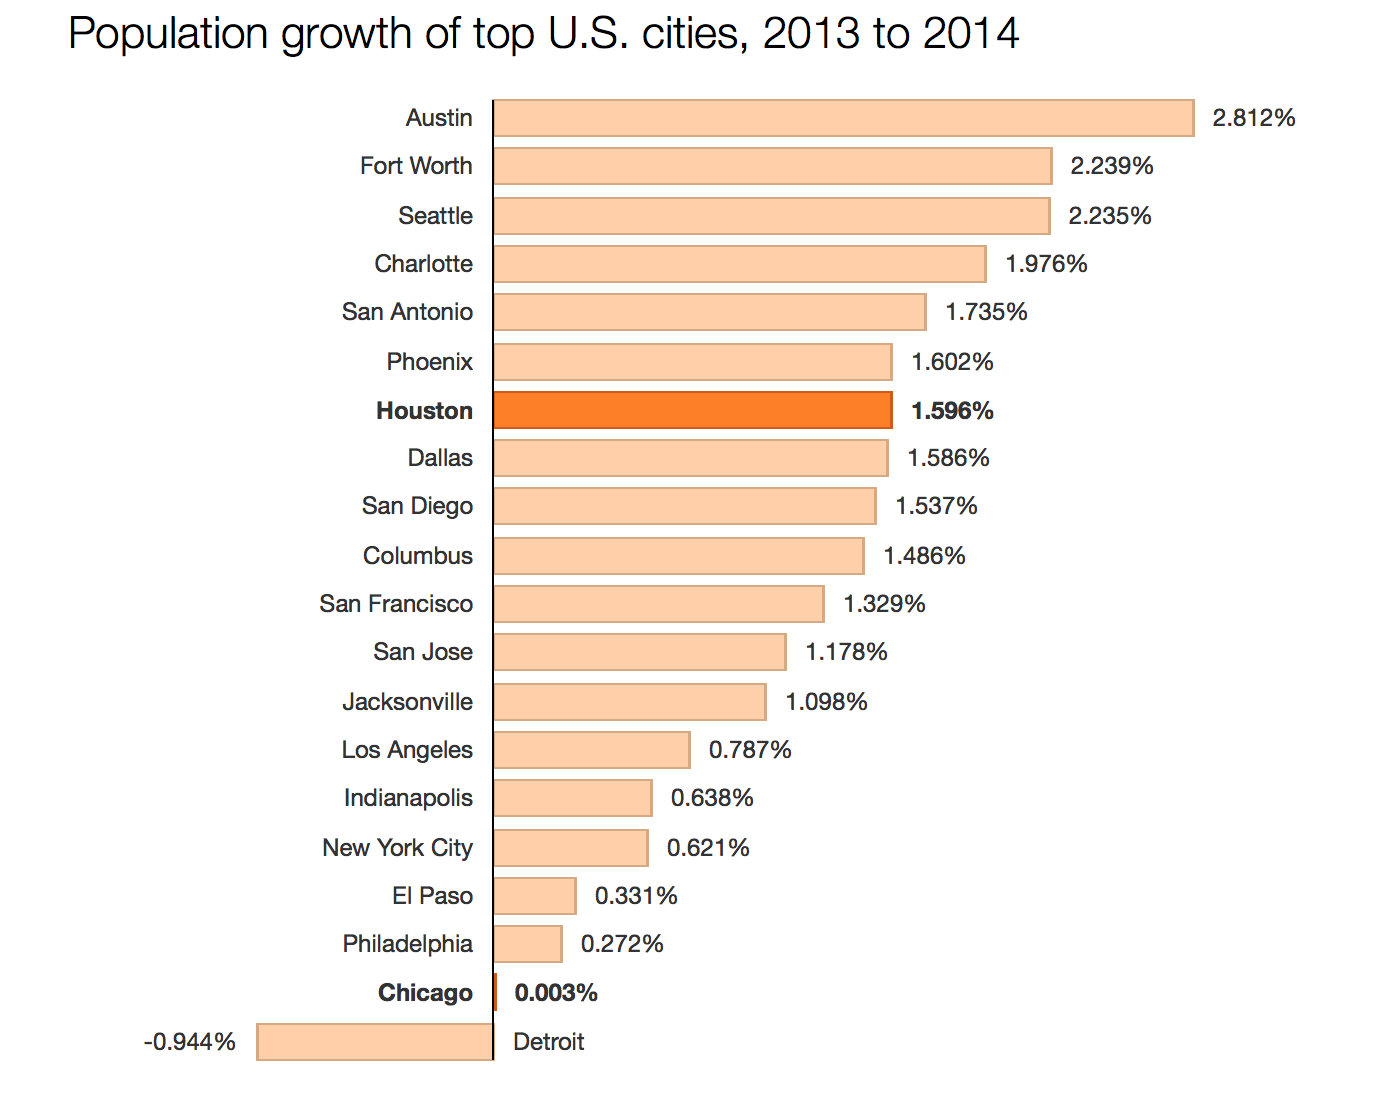 Source: U.S. Census